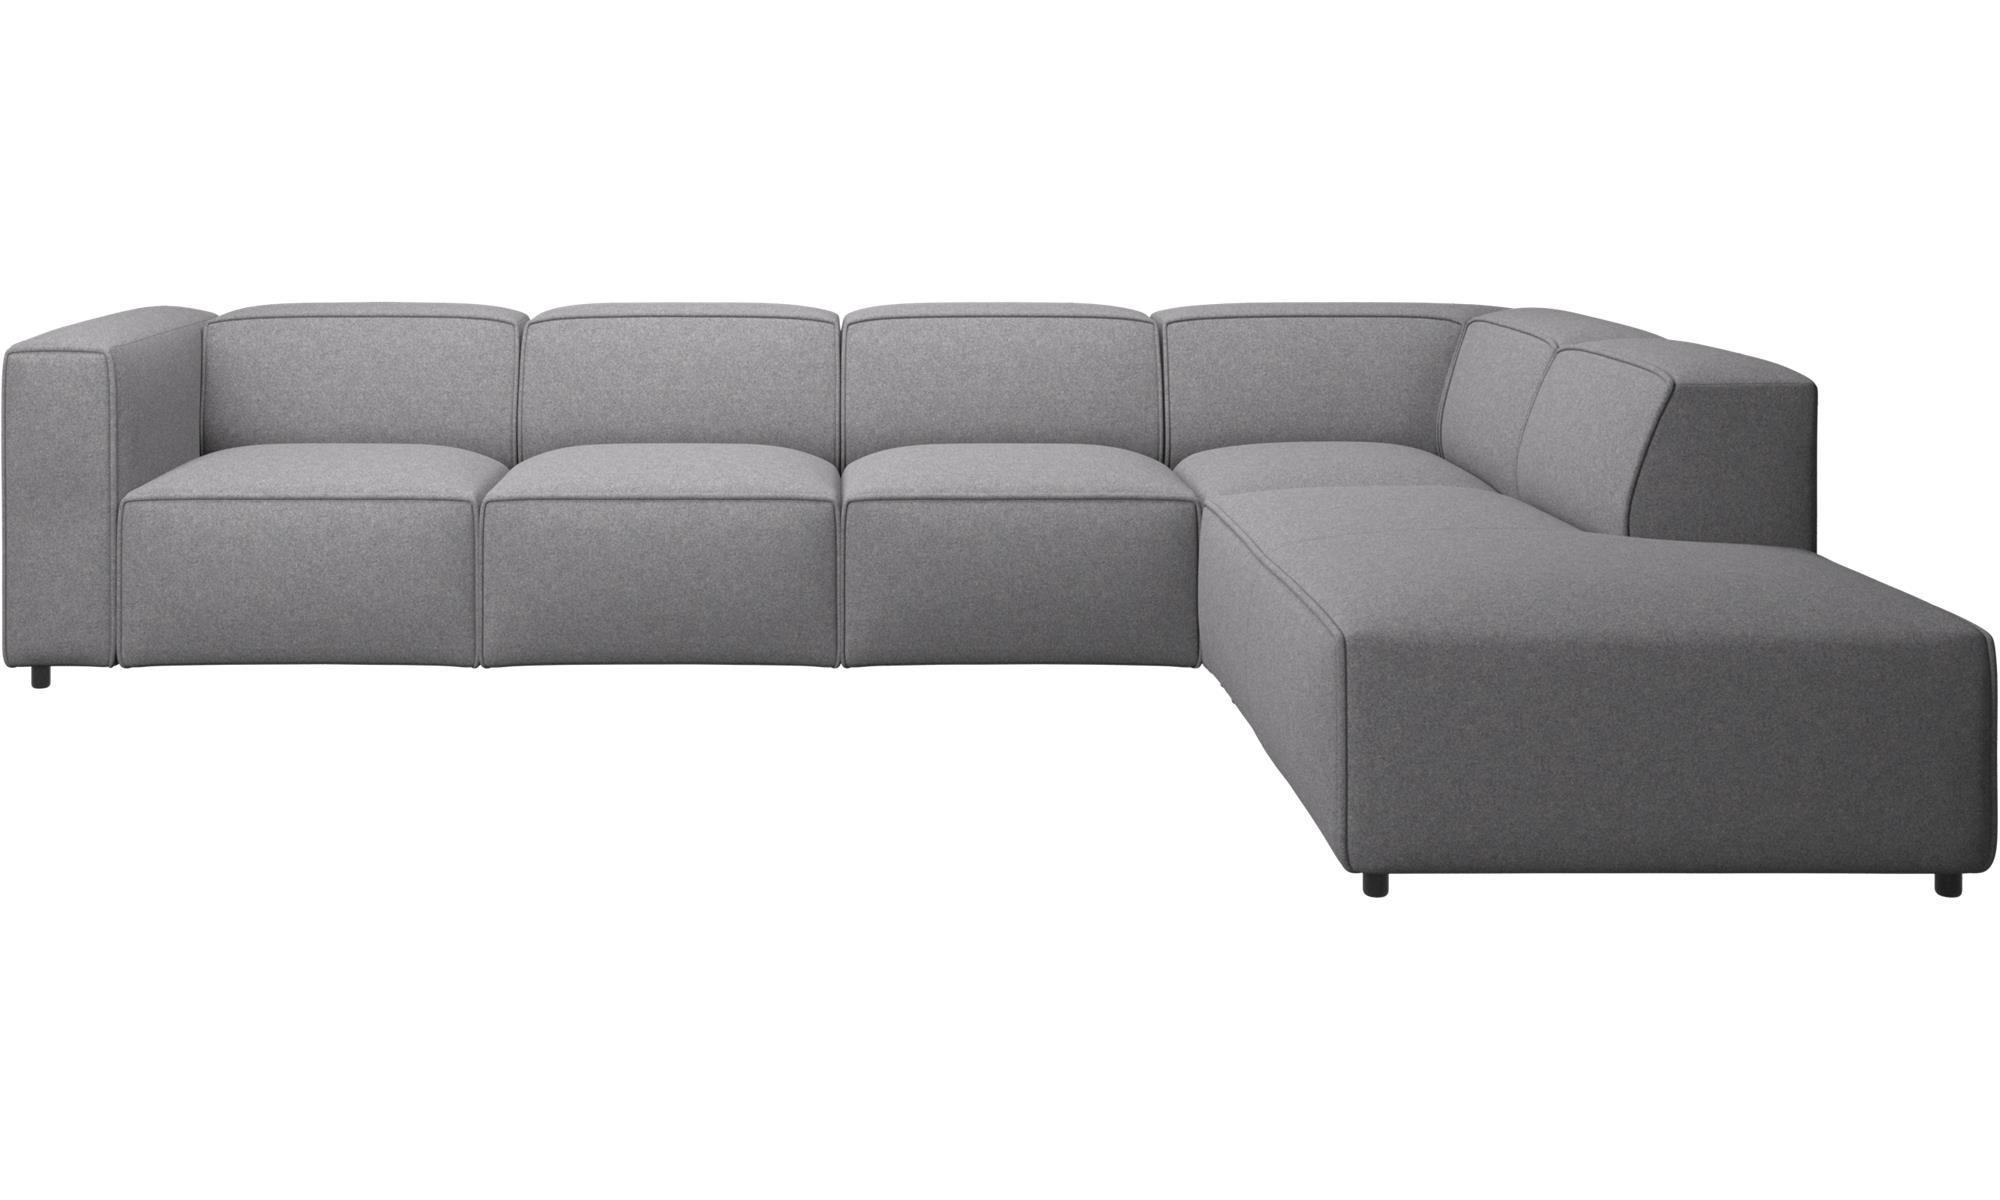 Corner sofas - Carmo corner sofa - Gray - Fabric | MWaz 2.0 ...